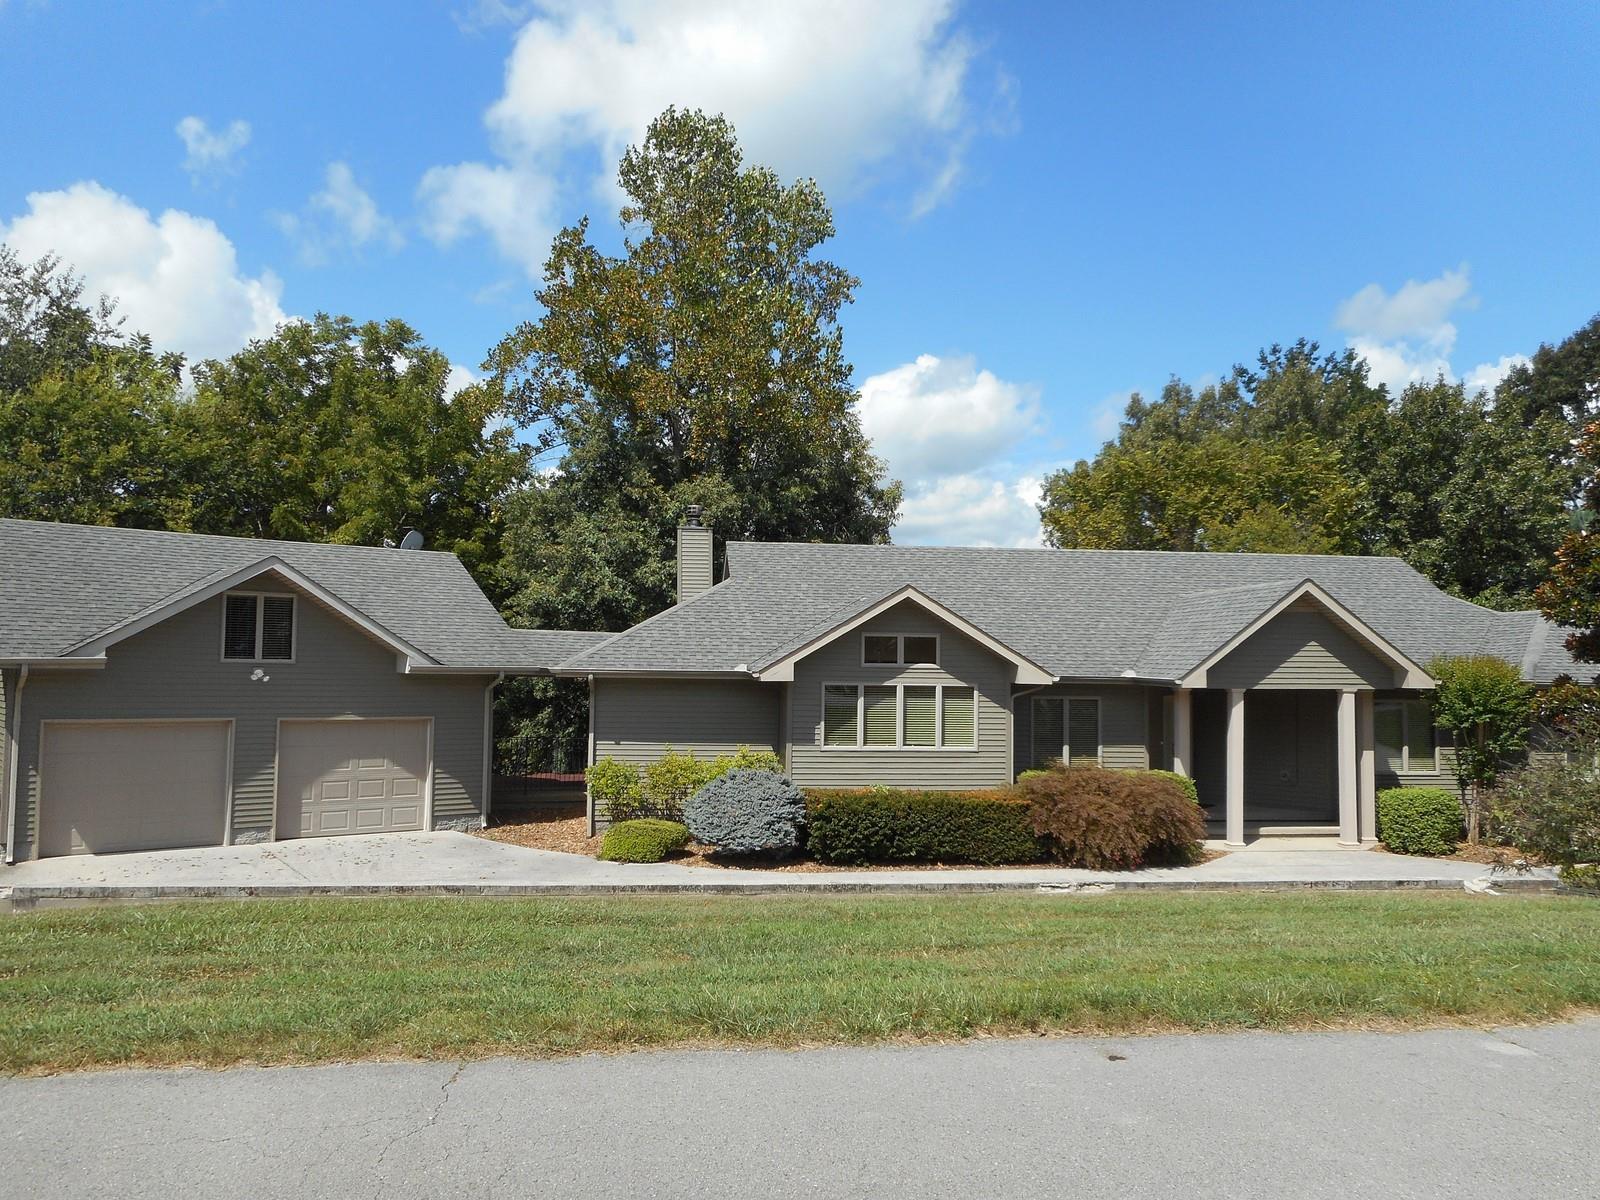 365 Bluff Dr, Winchester, TN 37398